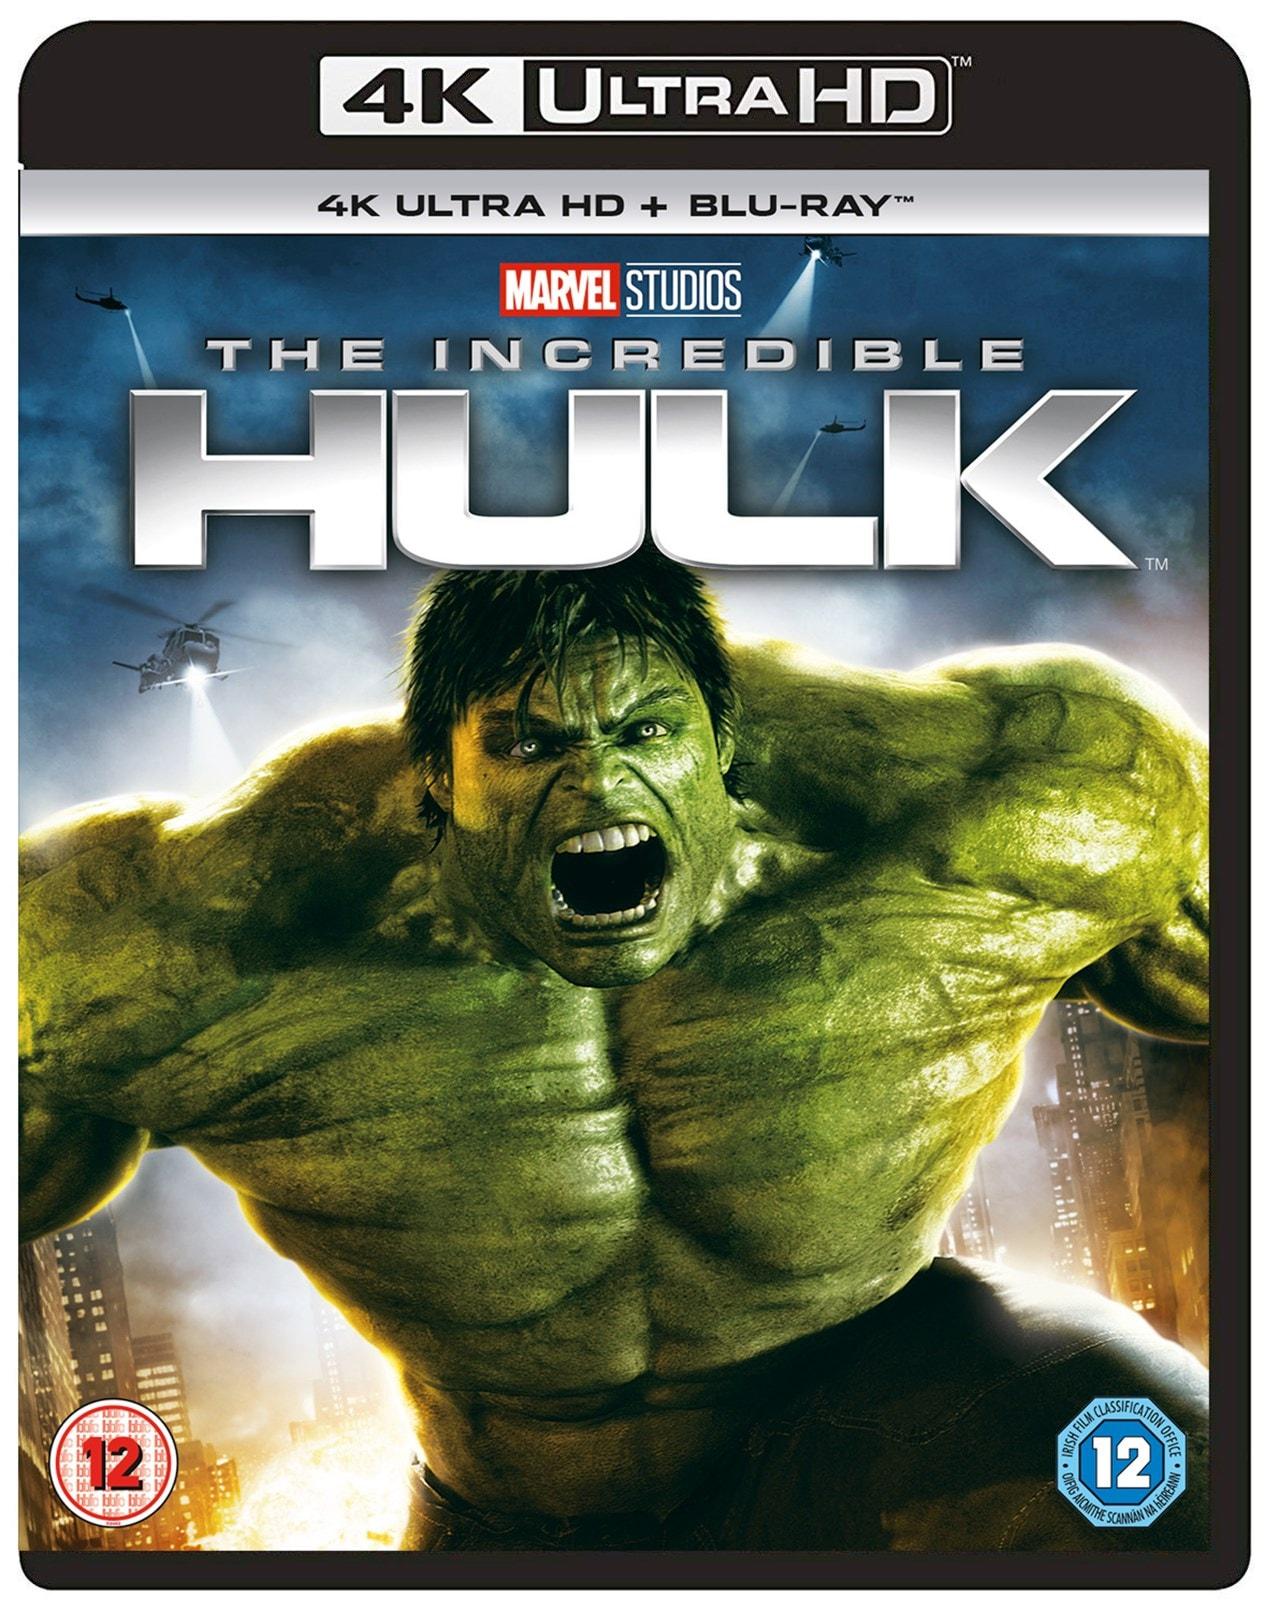 The Incredible Hulk - 1